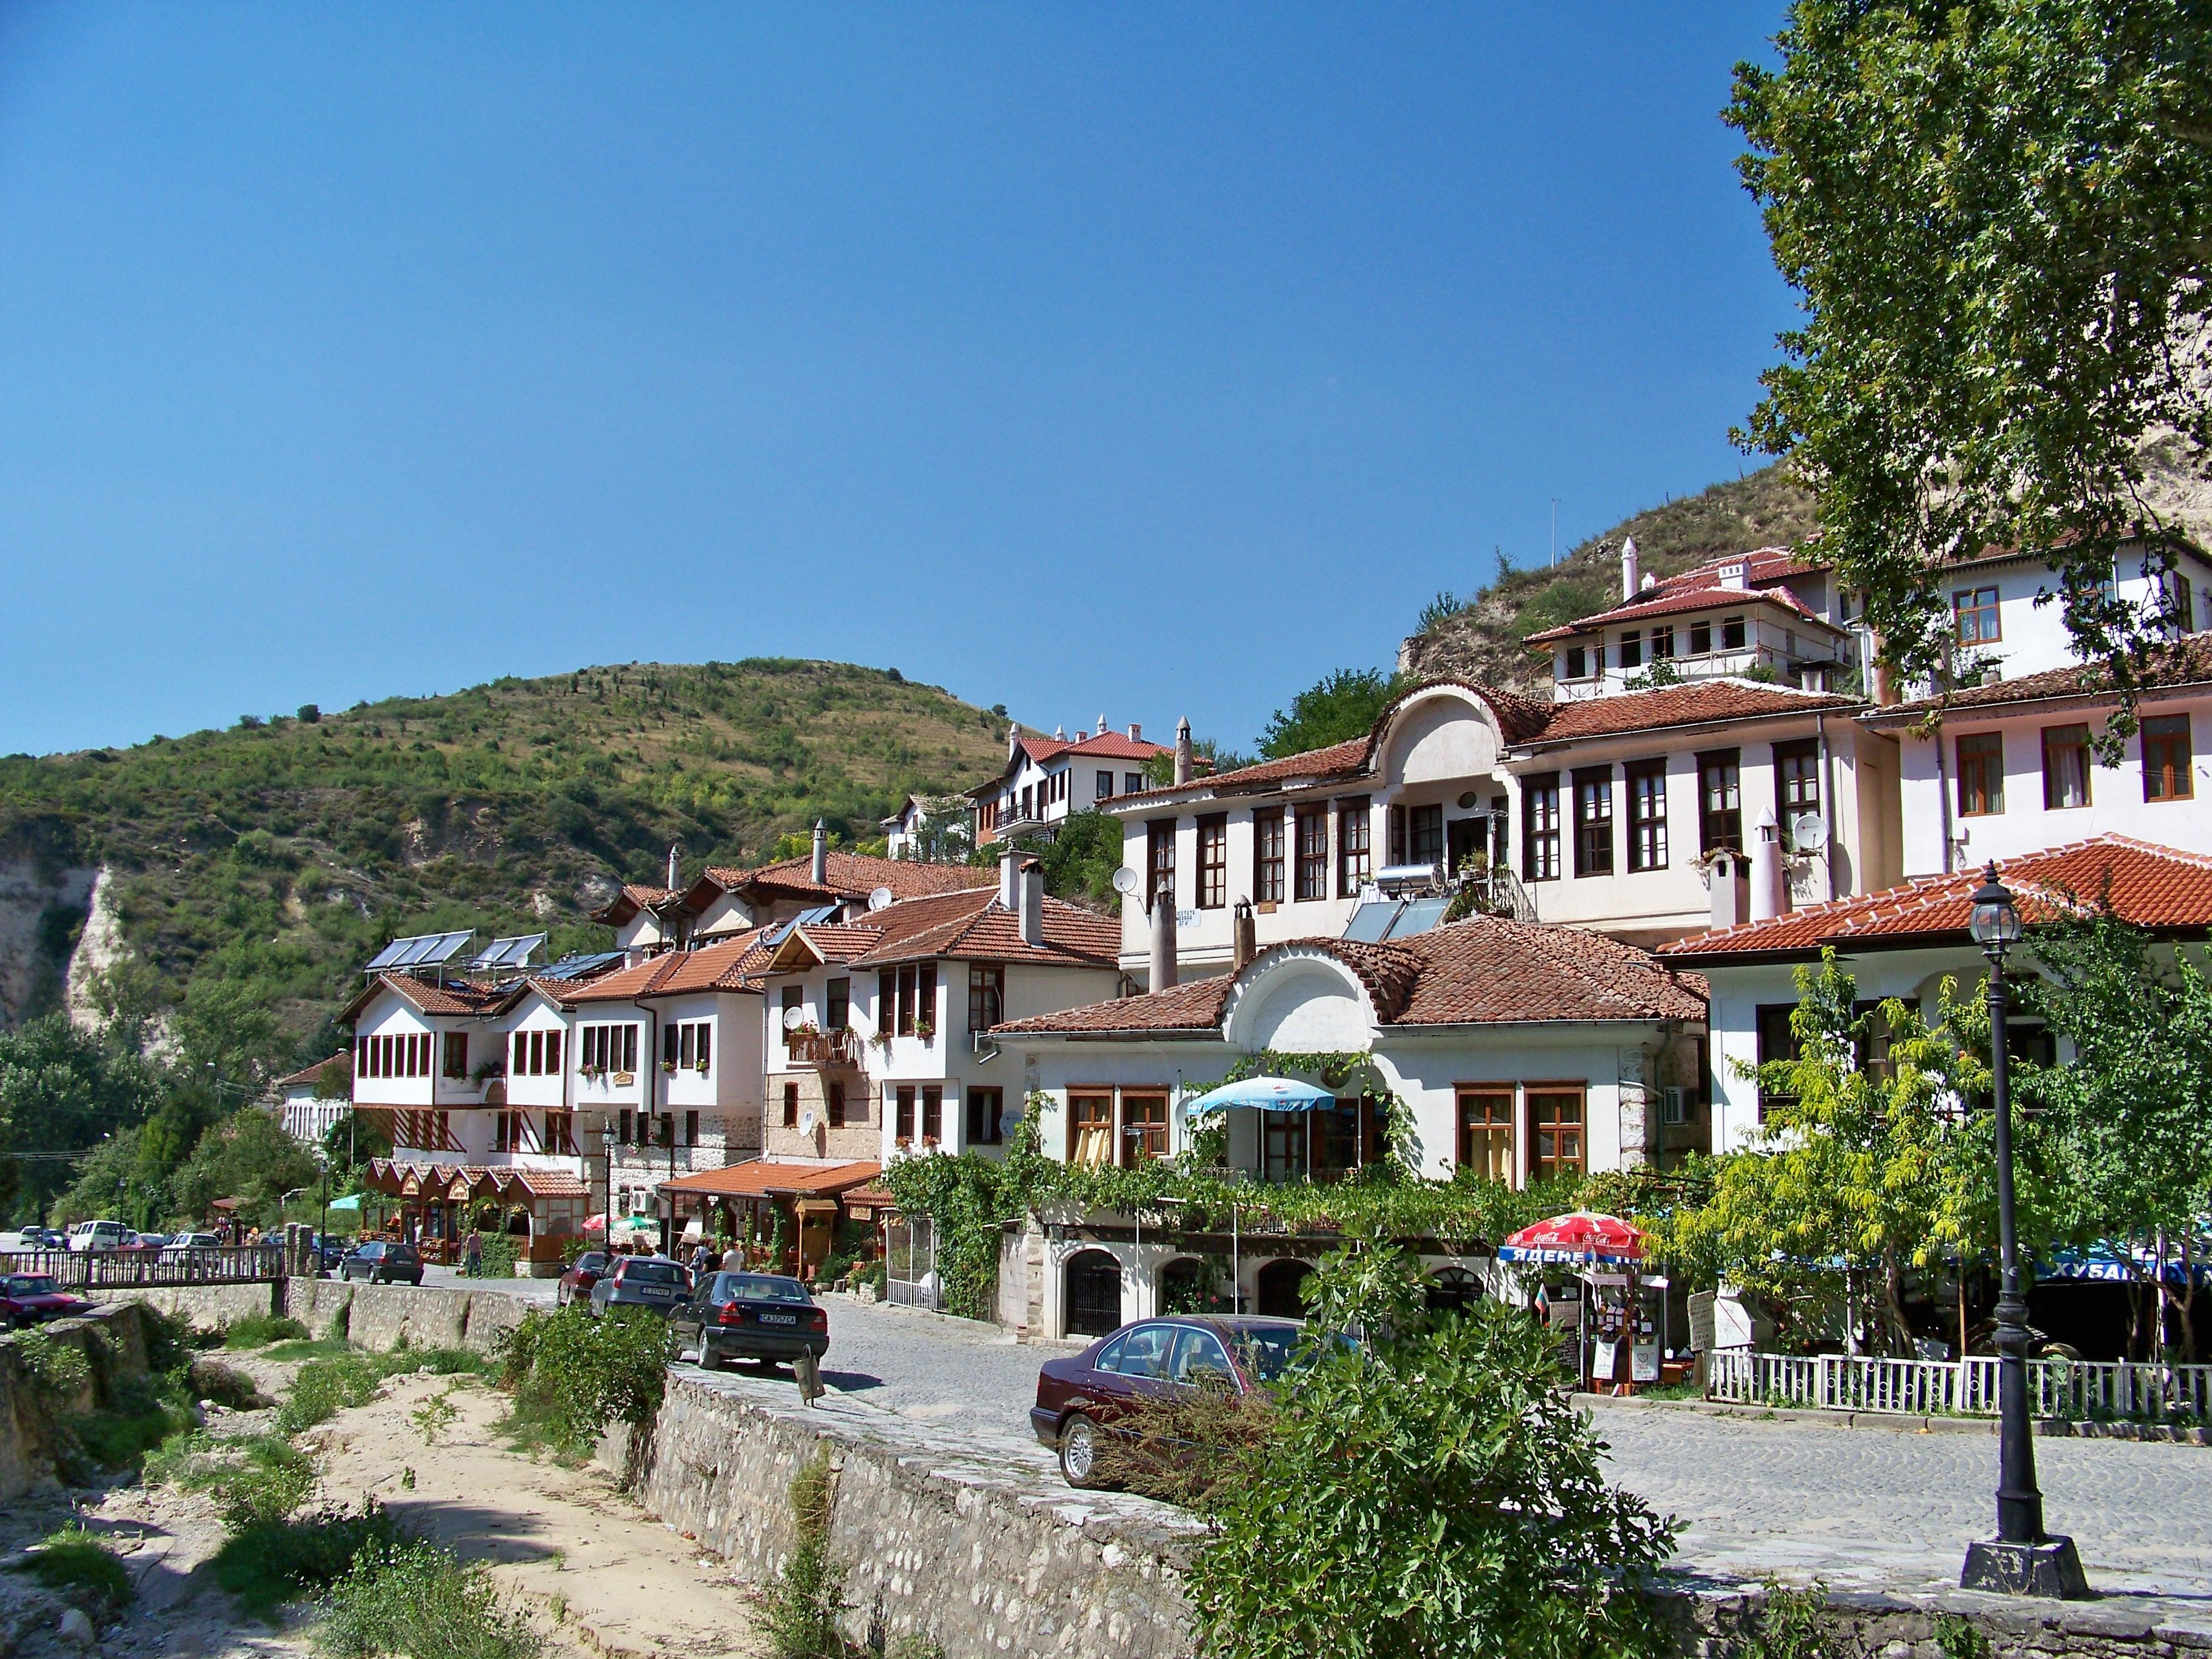 https://upload.wikimedia.org/wikipedia/commons/a/a2/Bulgaria_Melnik-04.jpg